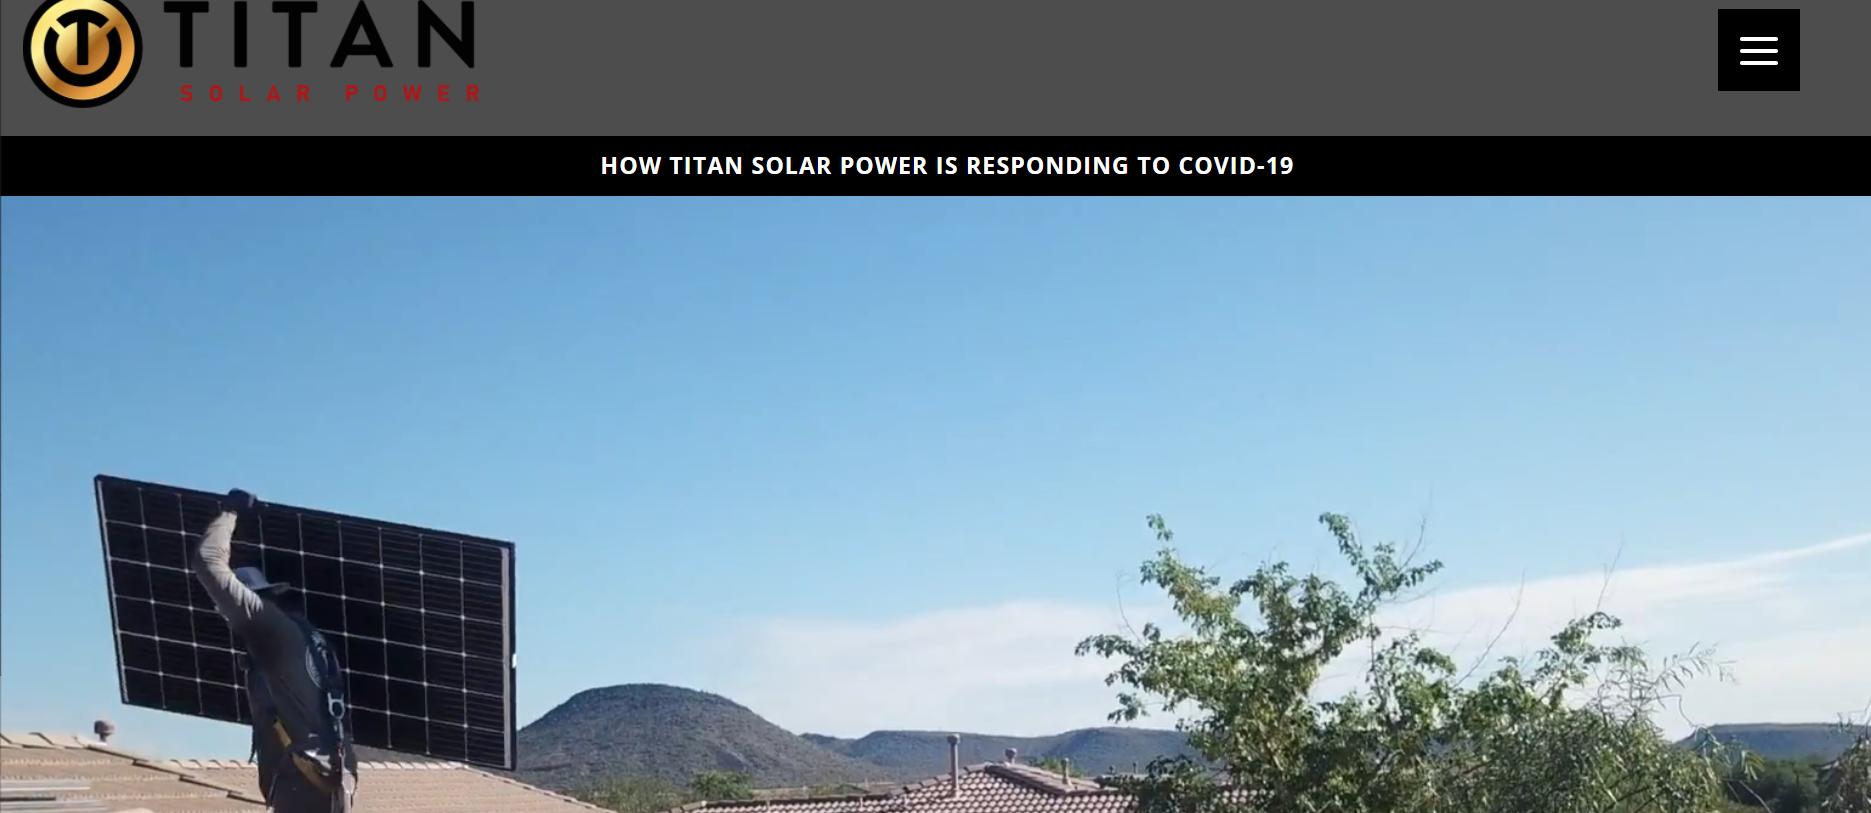 Titan Solar